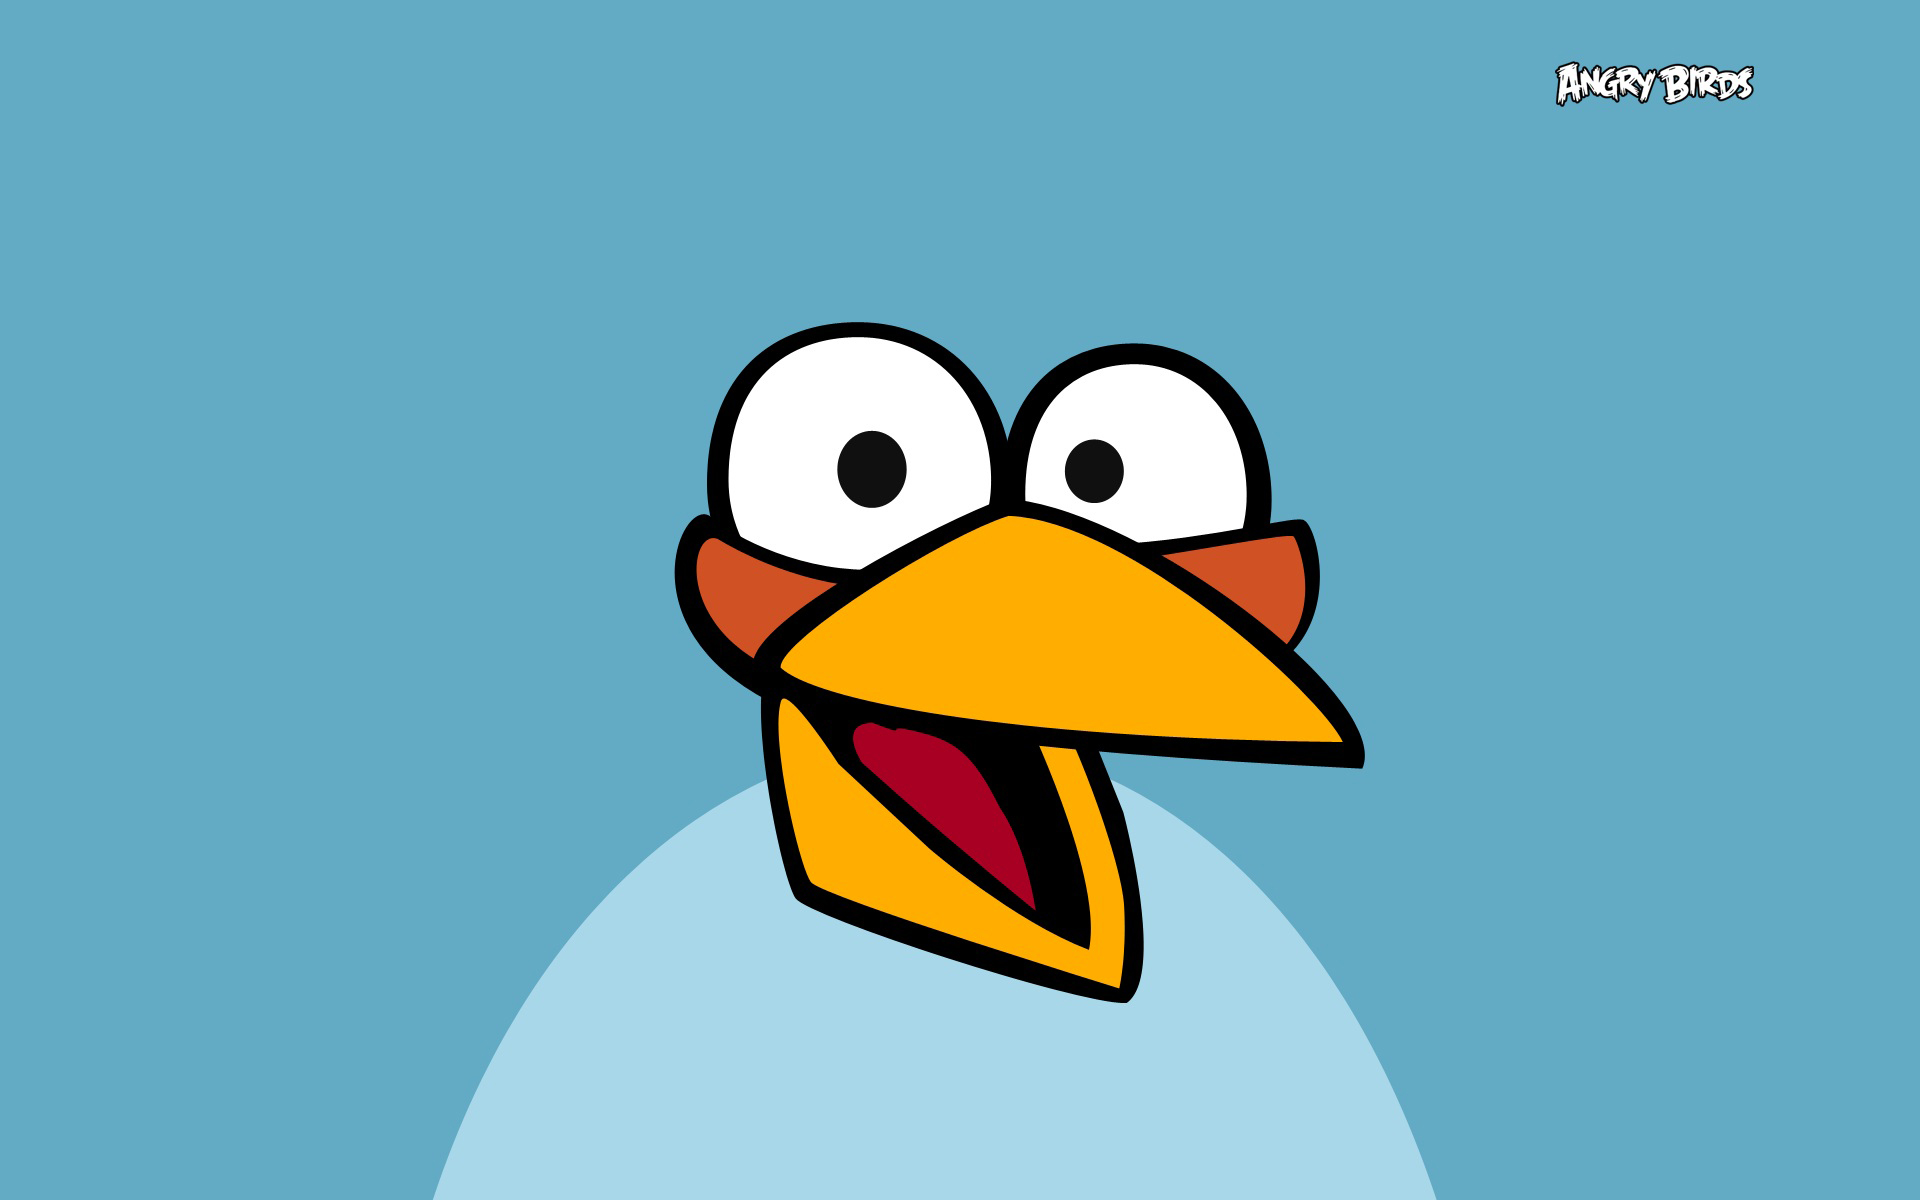 Blue Angry Bird Wallpapers 7568 Wallpaper Cool Walldiskpapercom 1920x1200